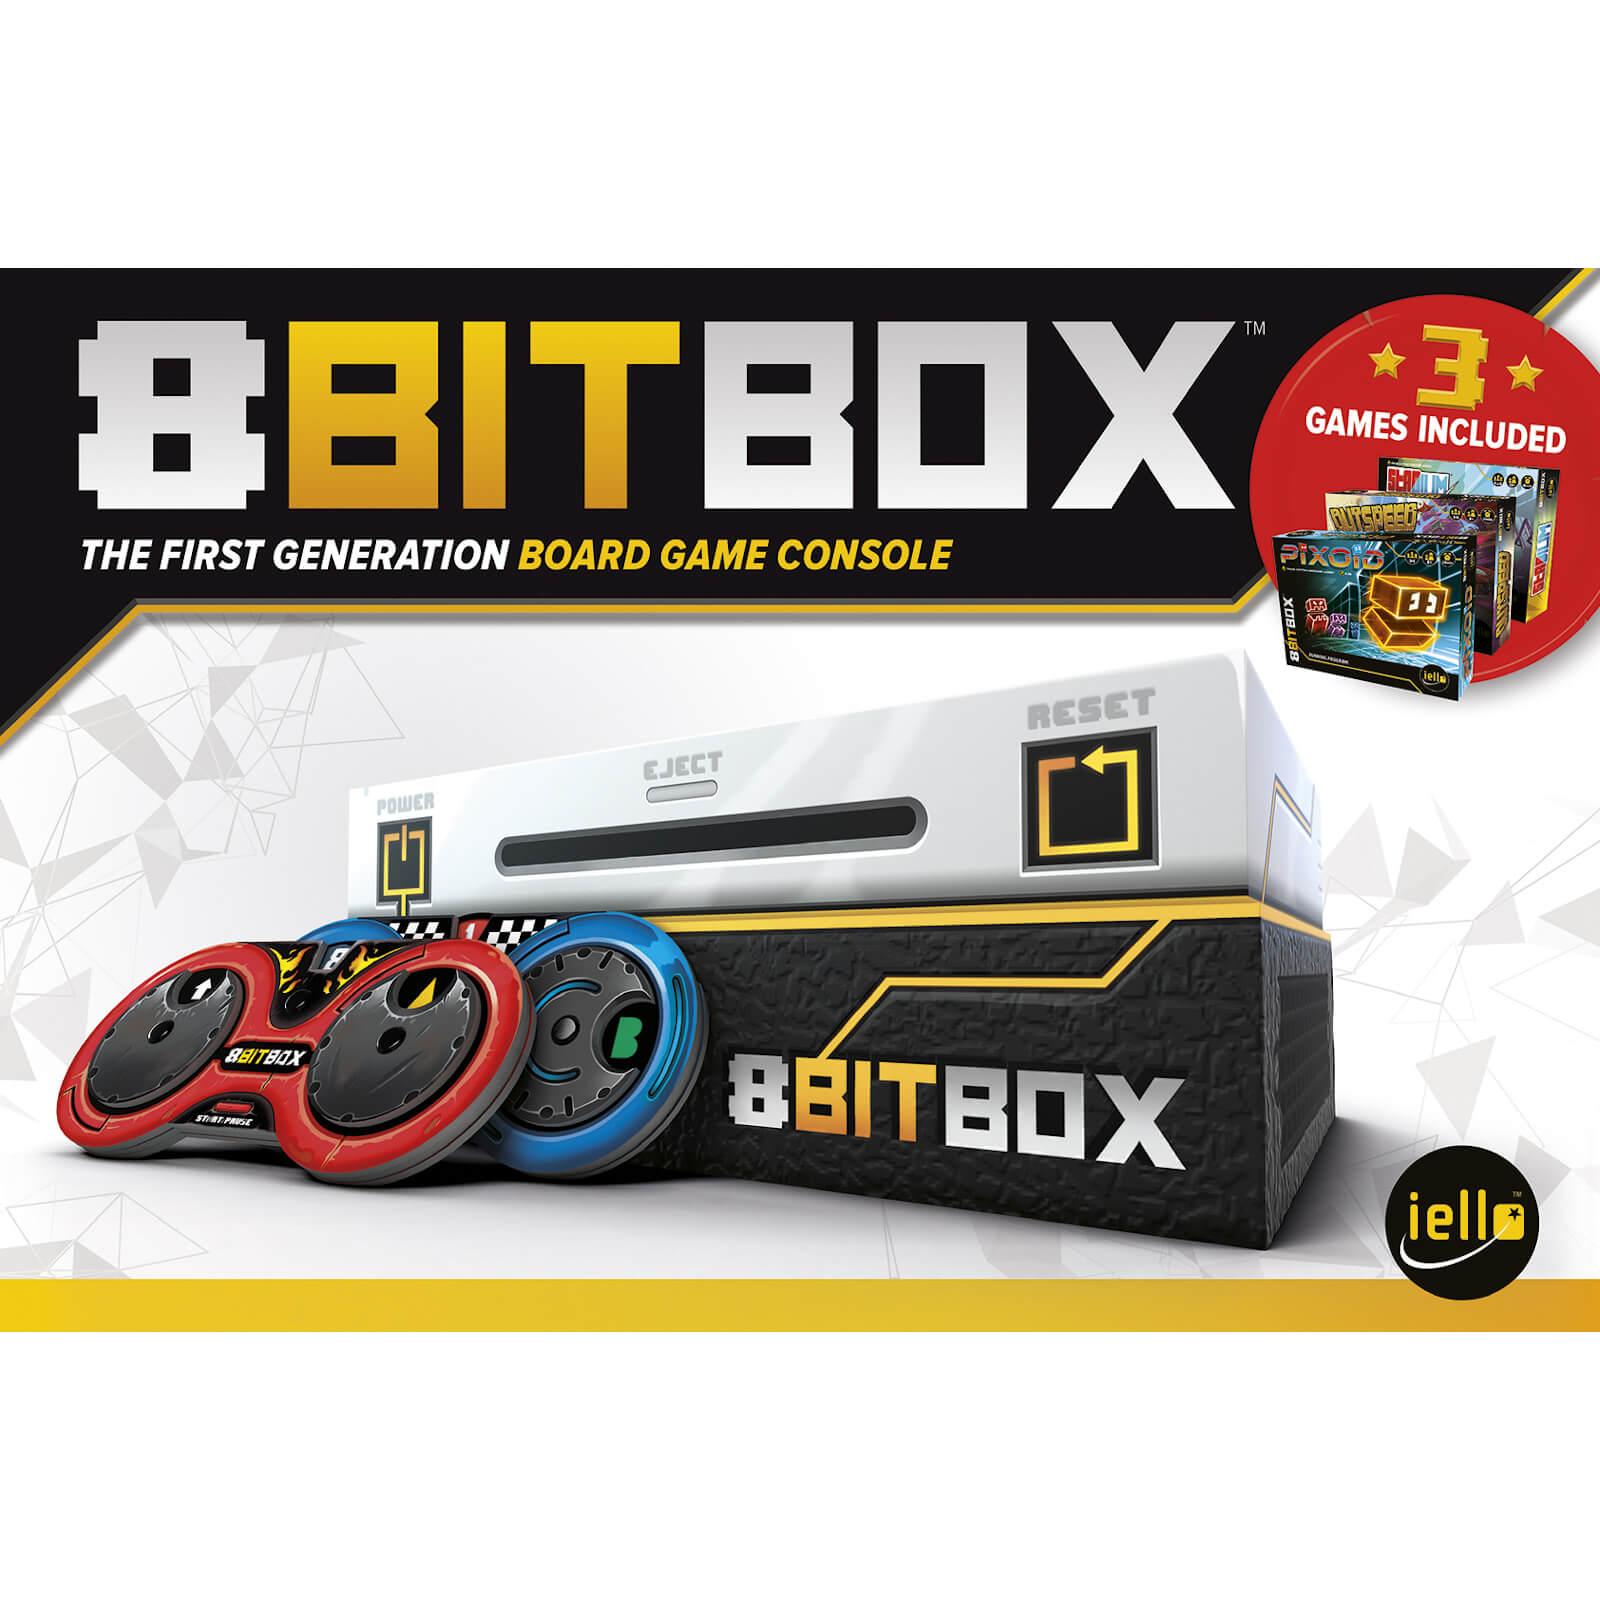 Image of 8Bit Box Board Game